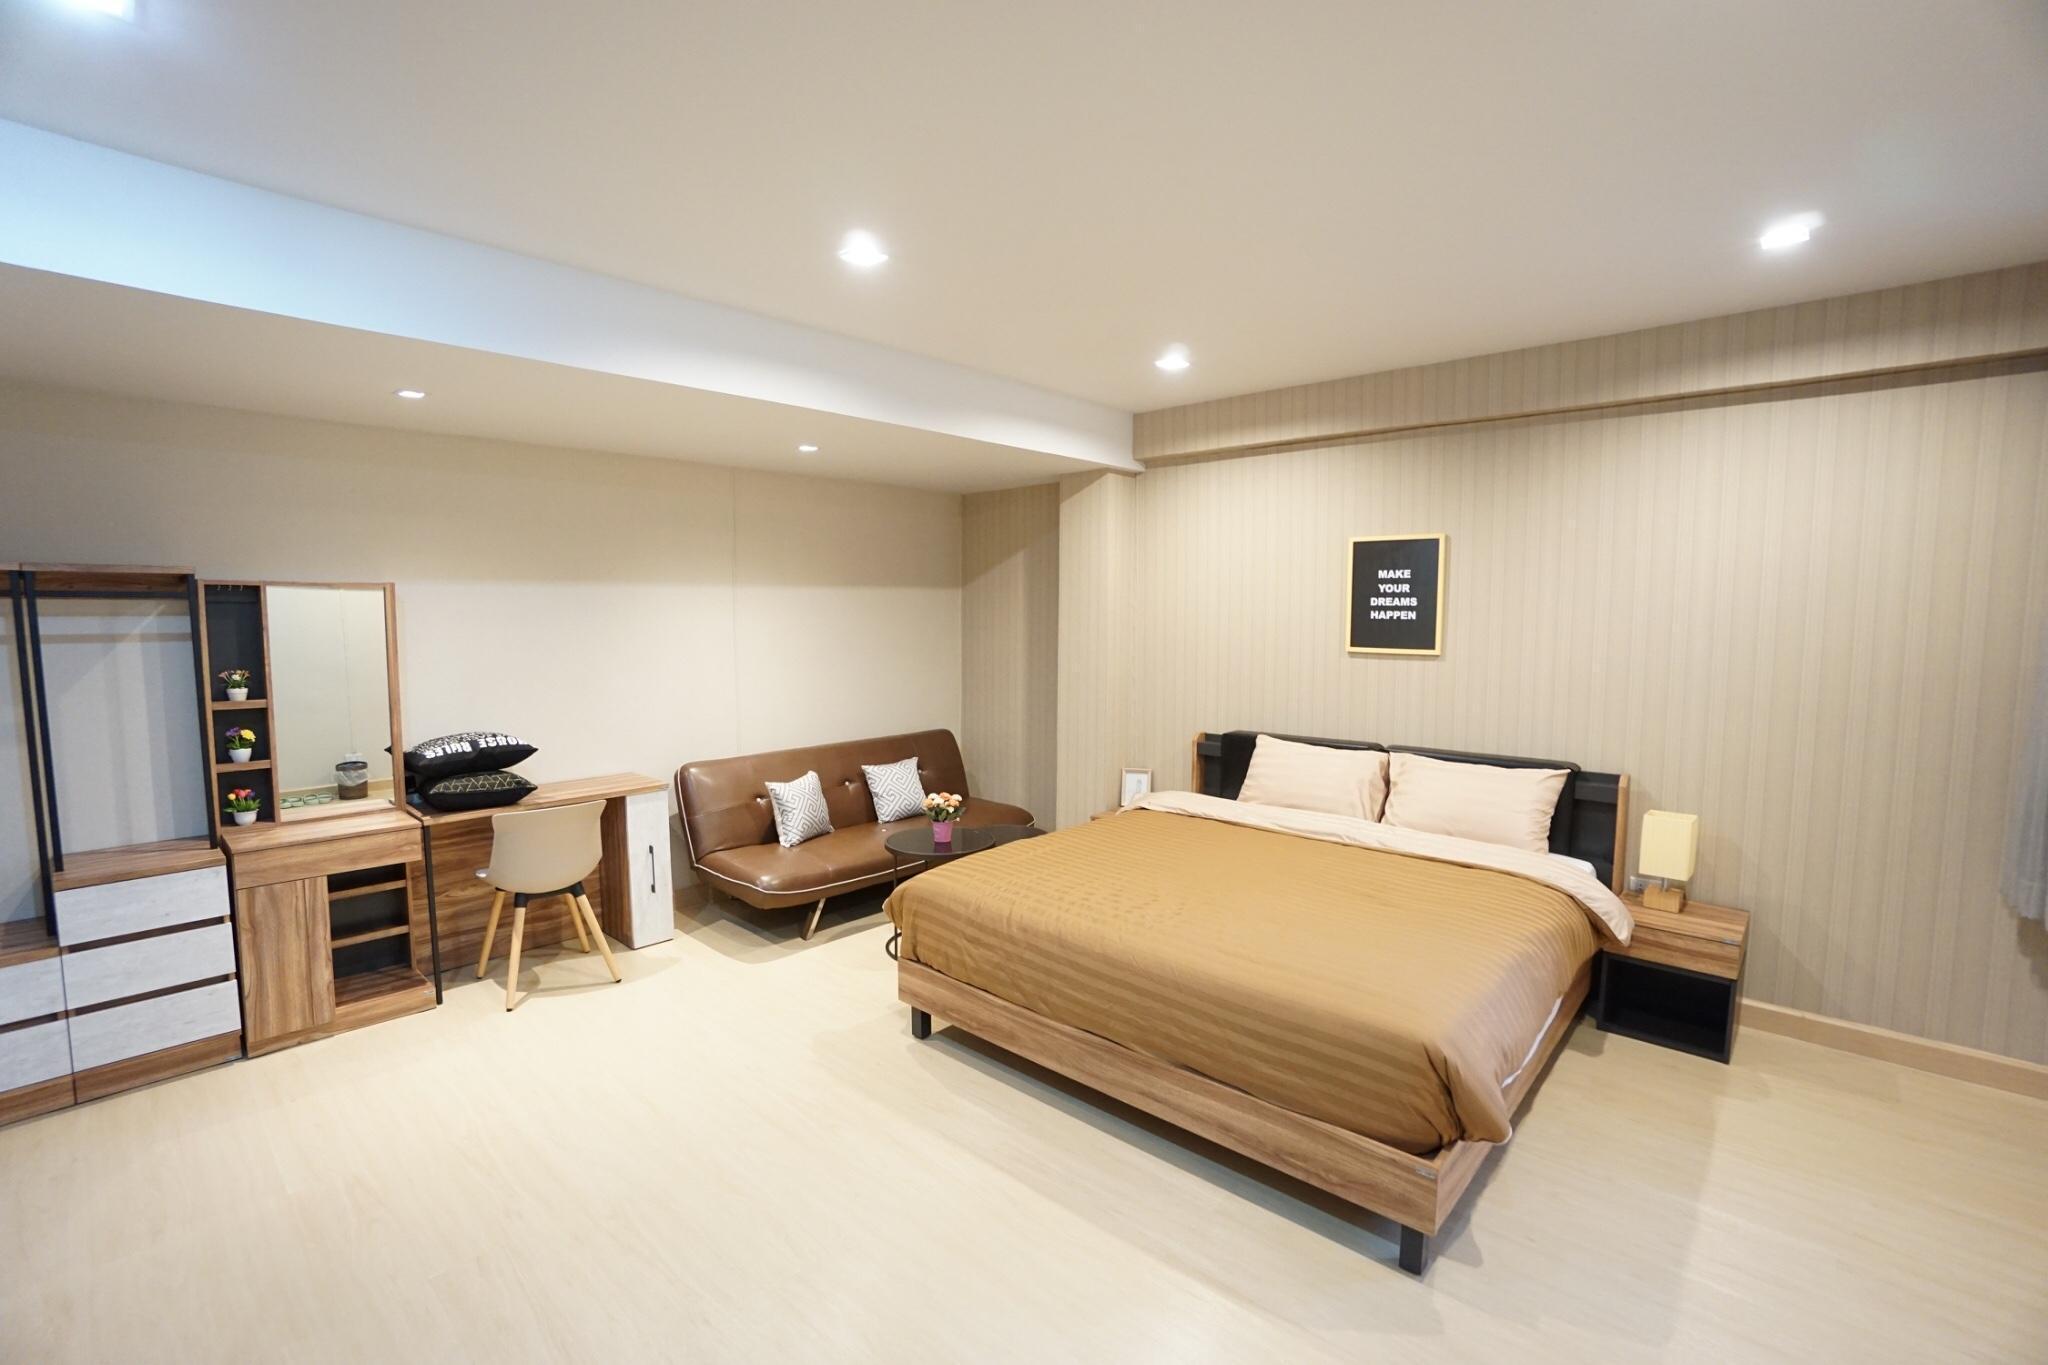 The best and cheap private room near Khaosan 409 สตูดิโอ อพาร์ตเมนต์ 1 ห้องน้ำส่วนตัว ขนาด 17 ตร.ม. – เยาวราช